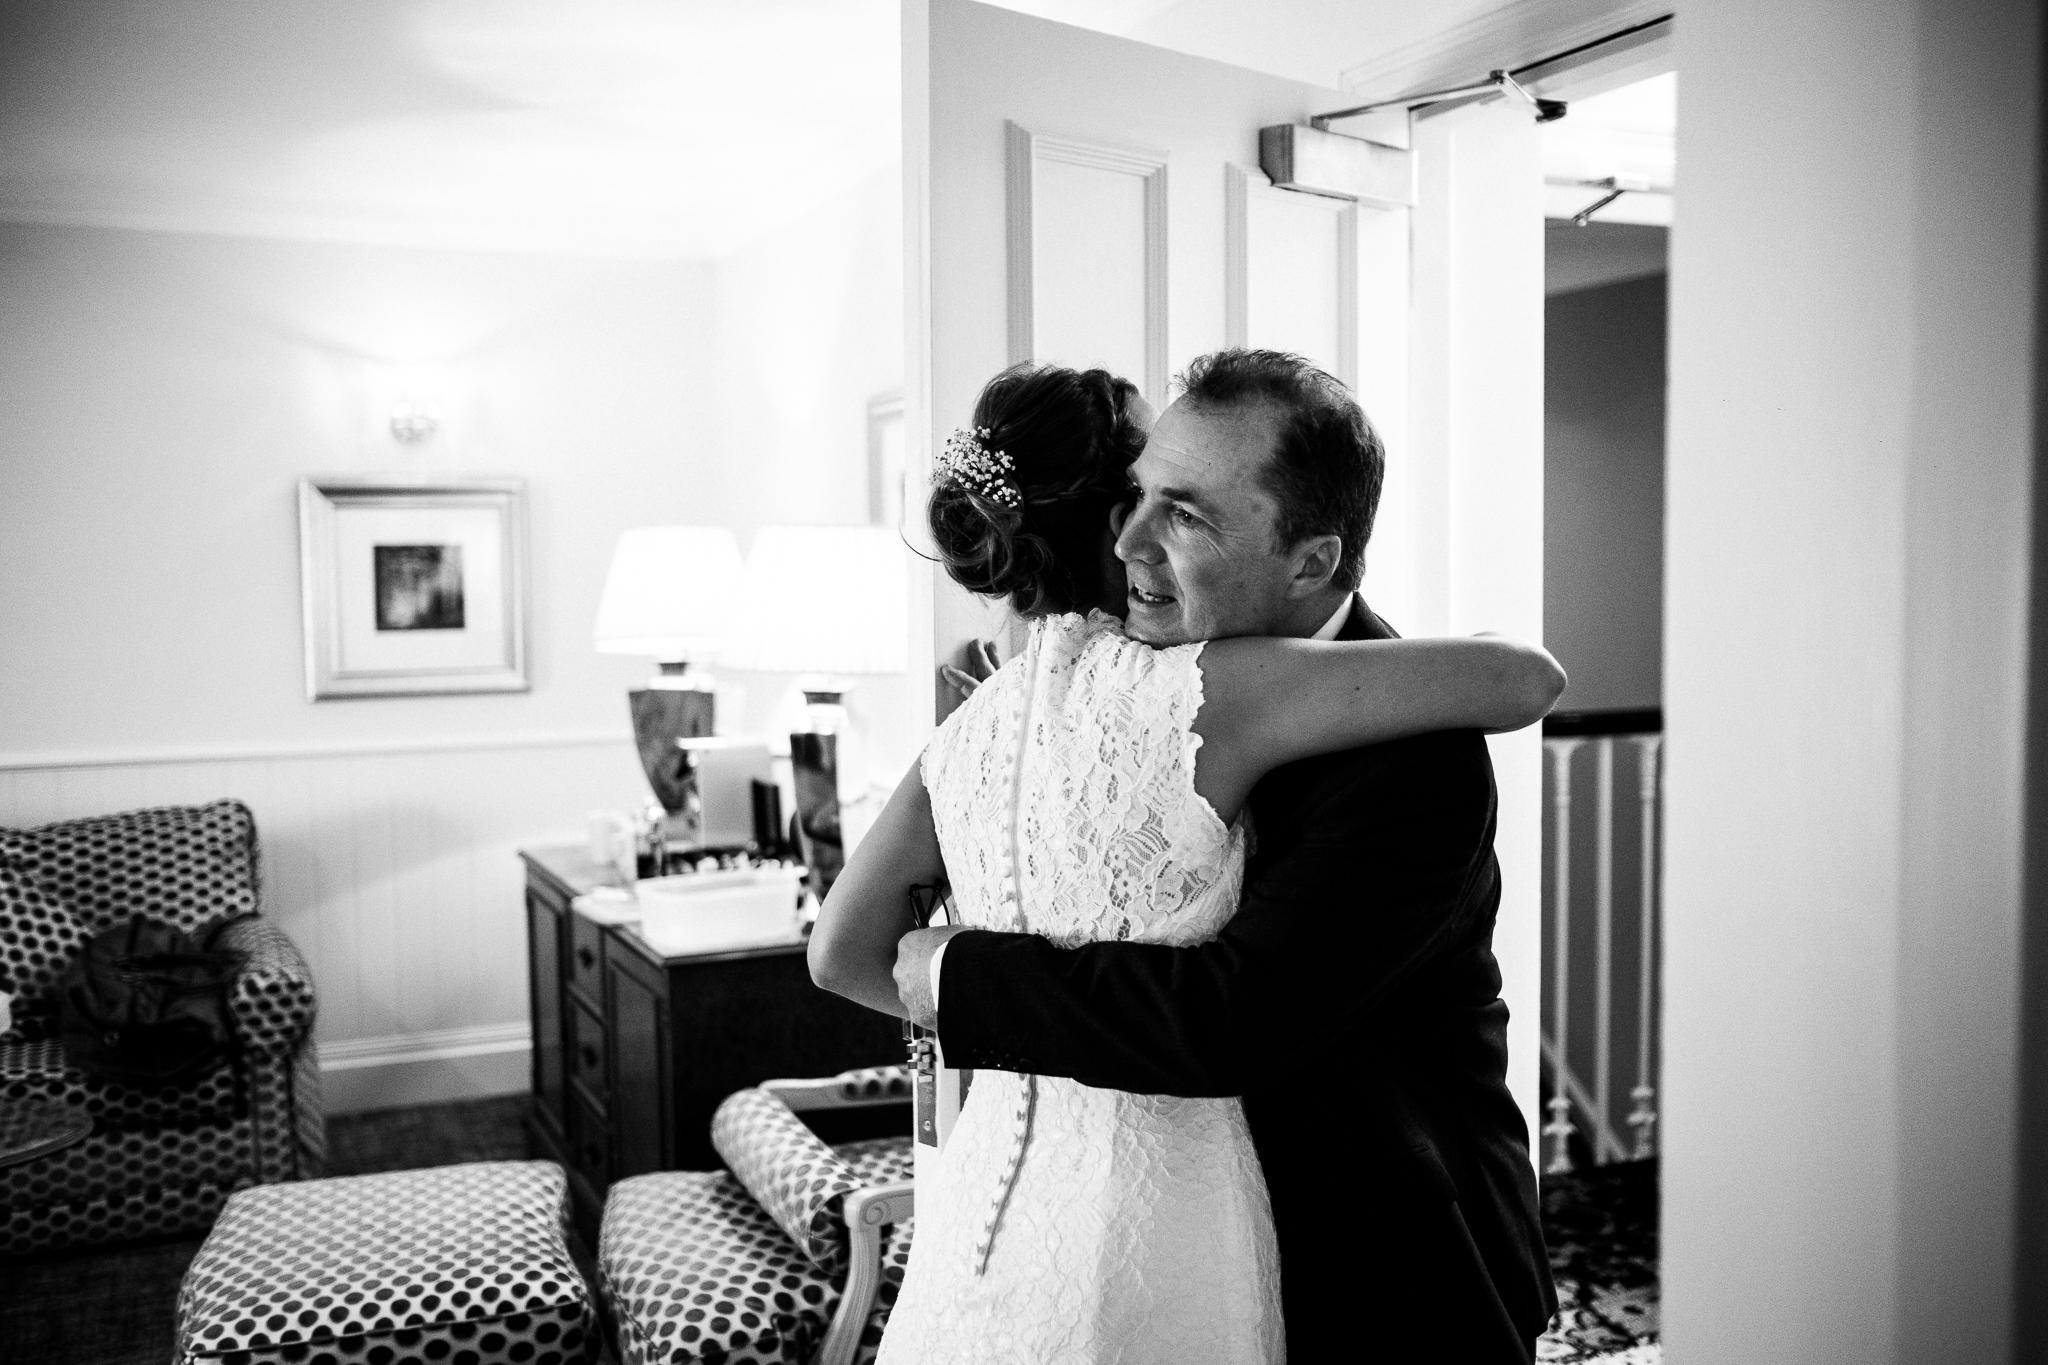 Relaxed Documentary Wedding Photography at The Wizard Inn, Alderley Edge Cheshire - Jenny Harper-11.jpg